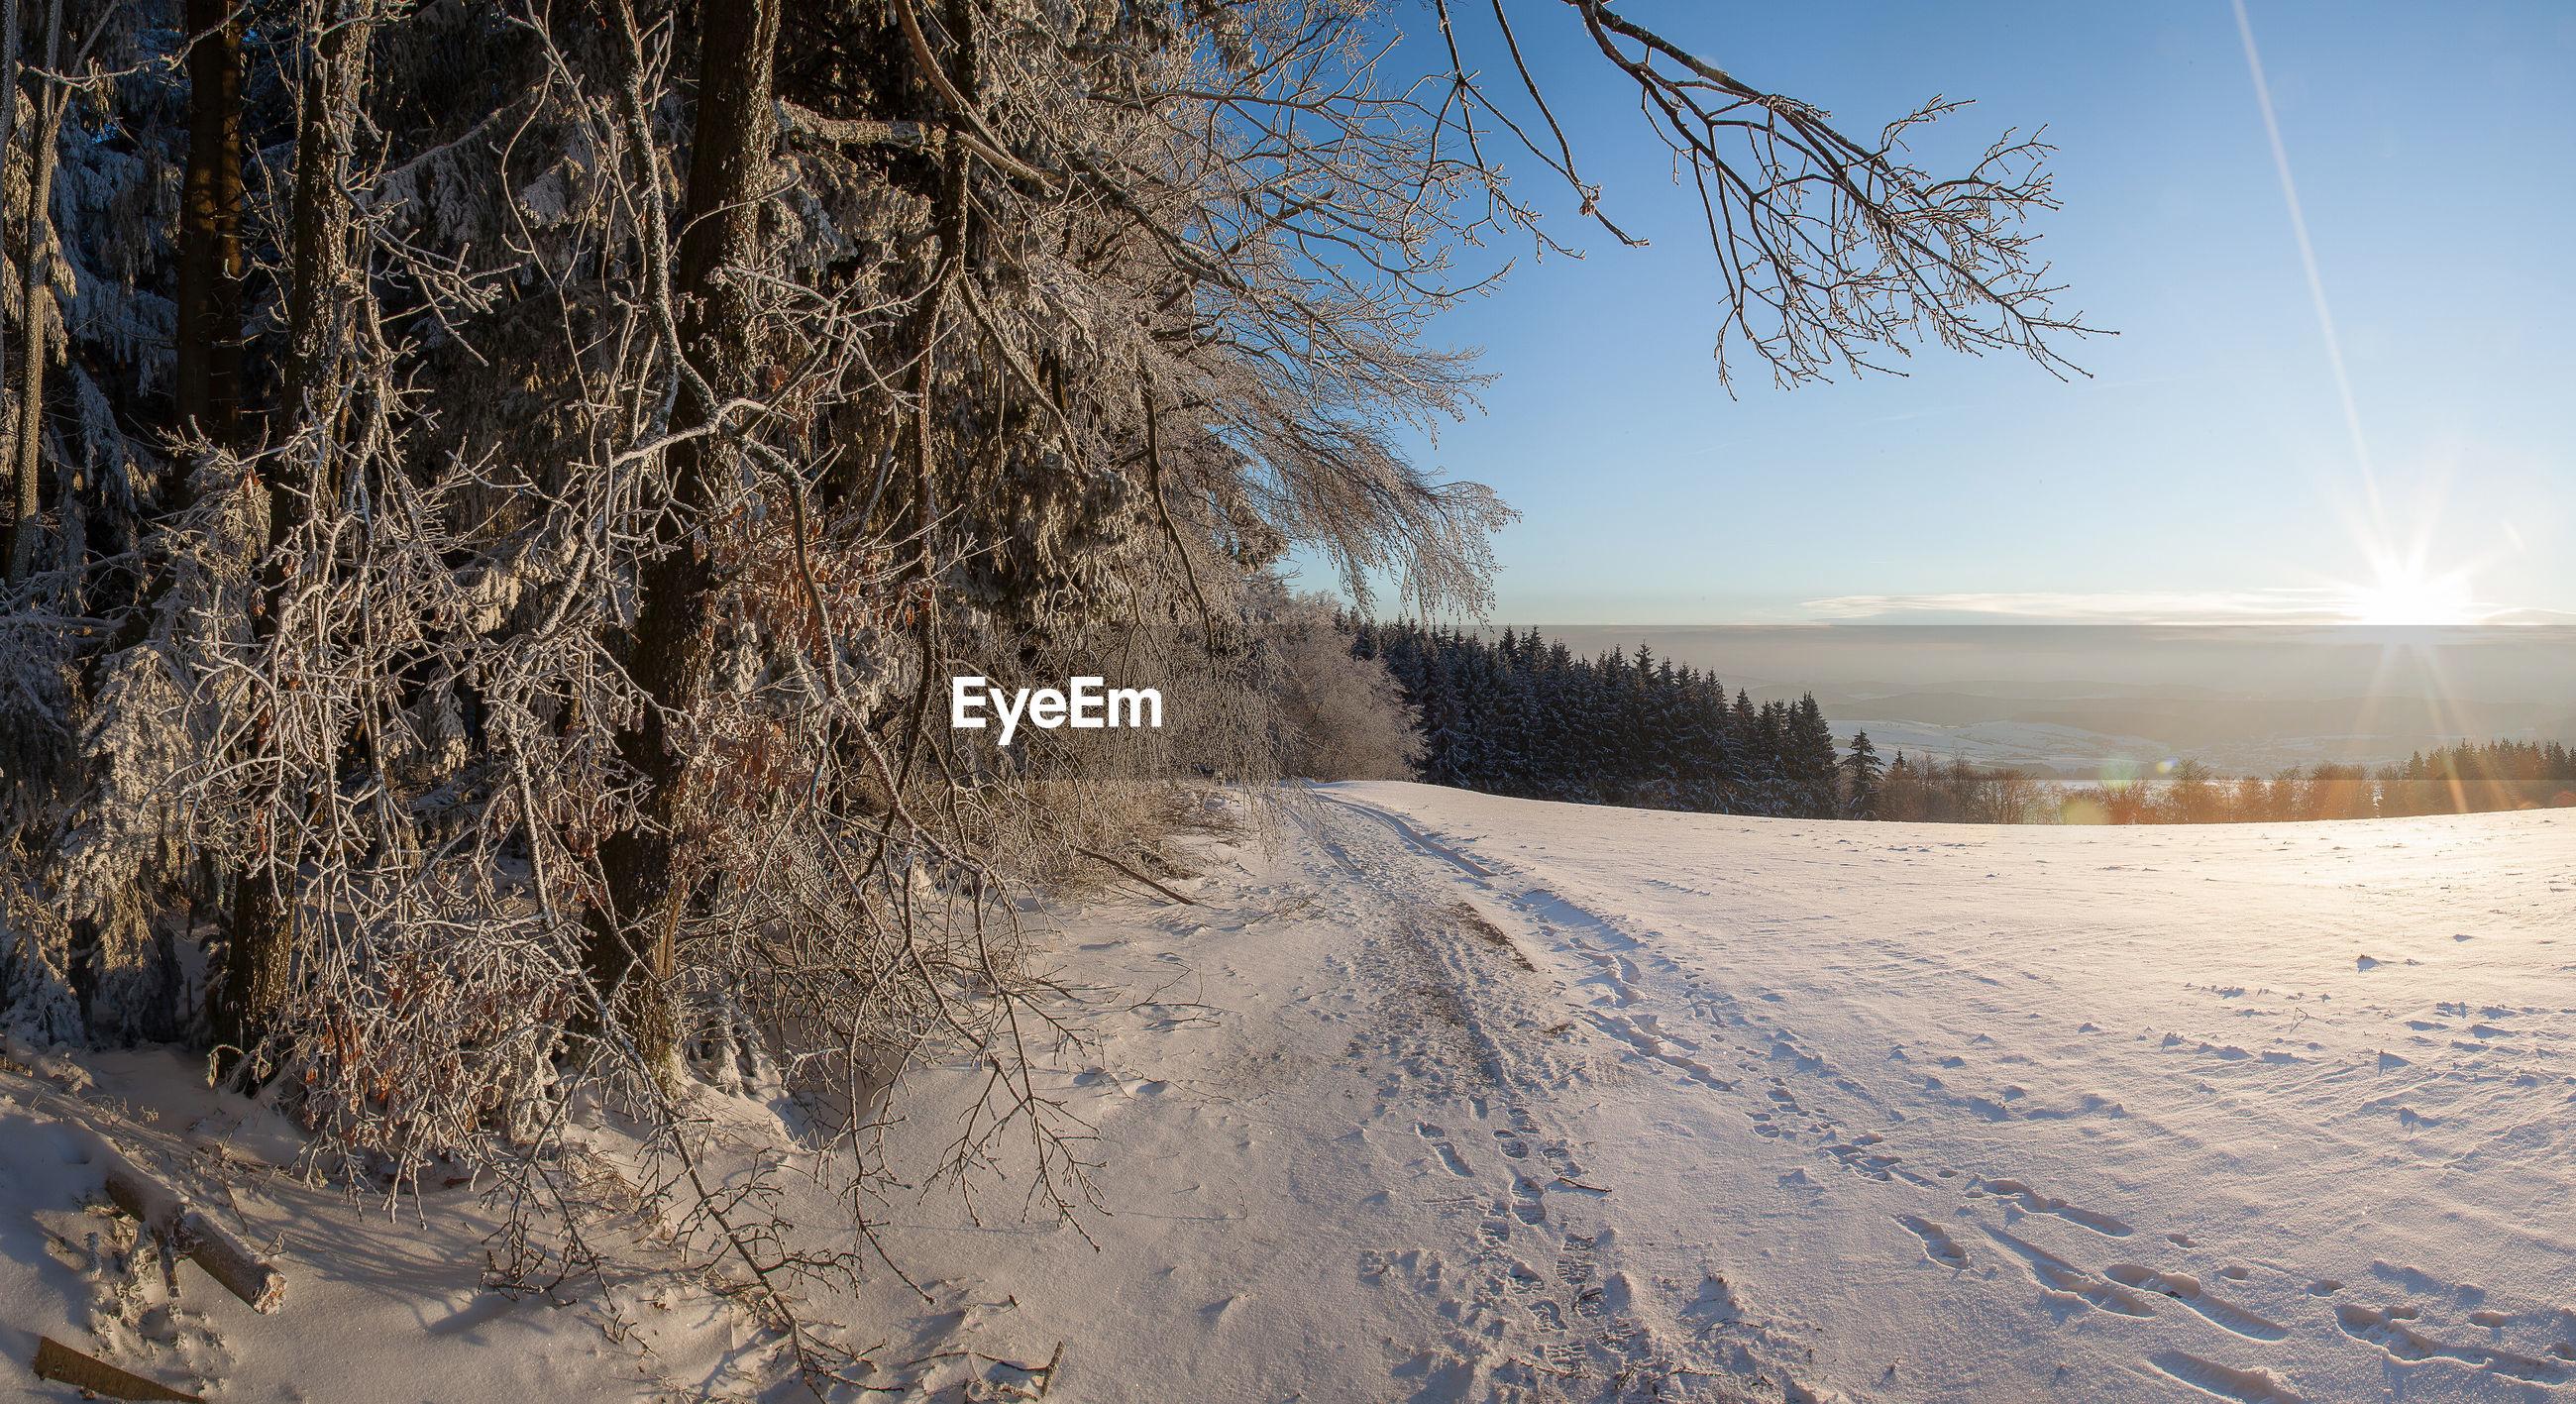 BARE TREE ON SNOW FIELD AGAINST SKY